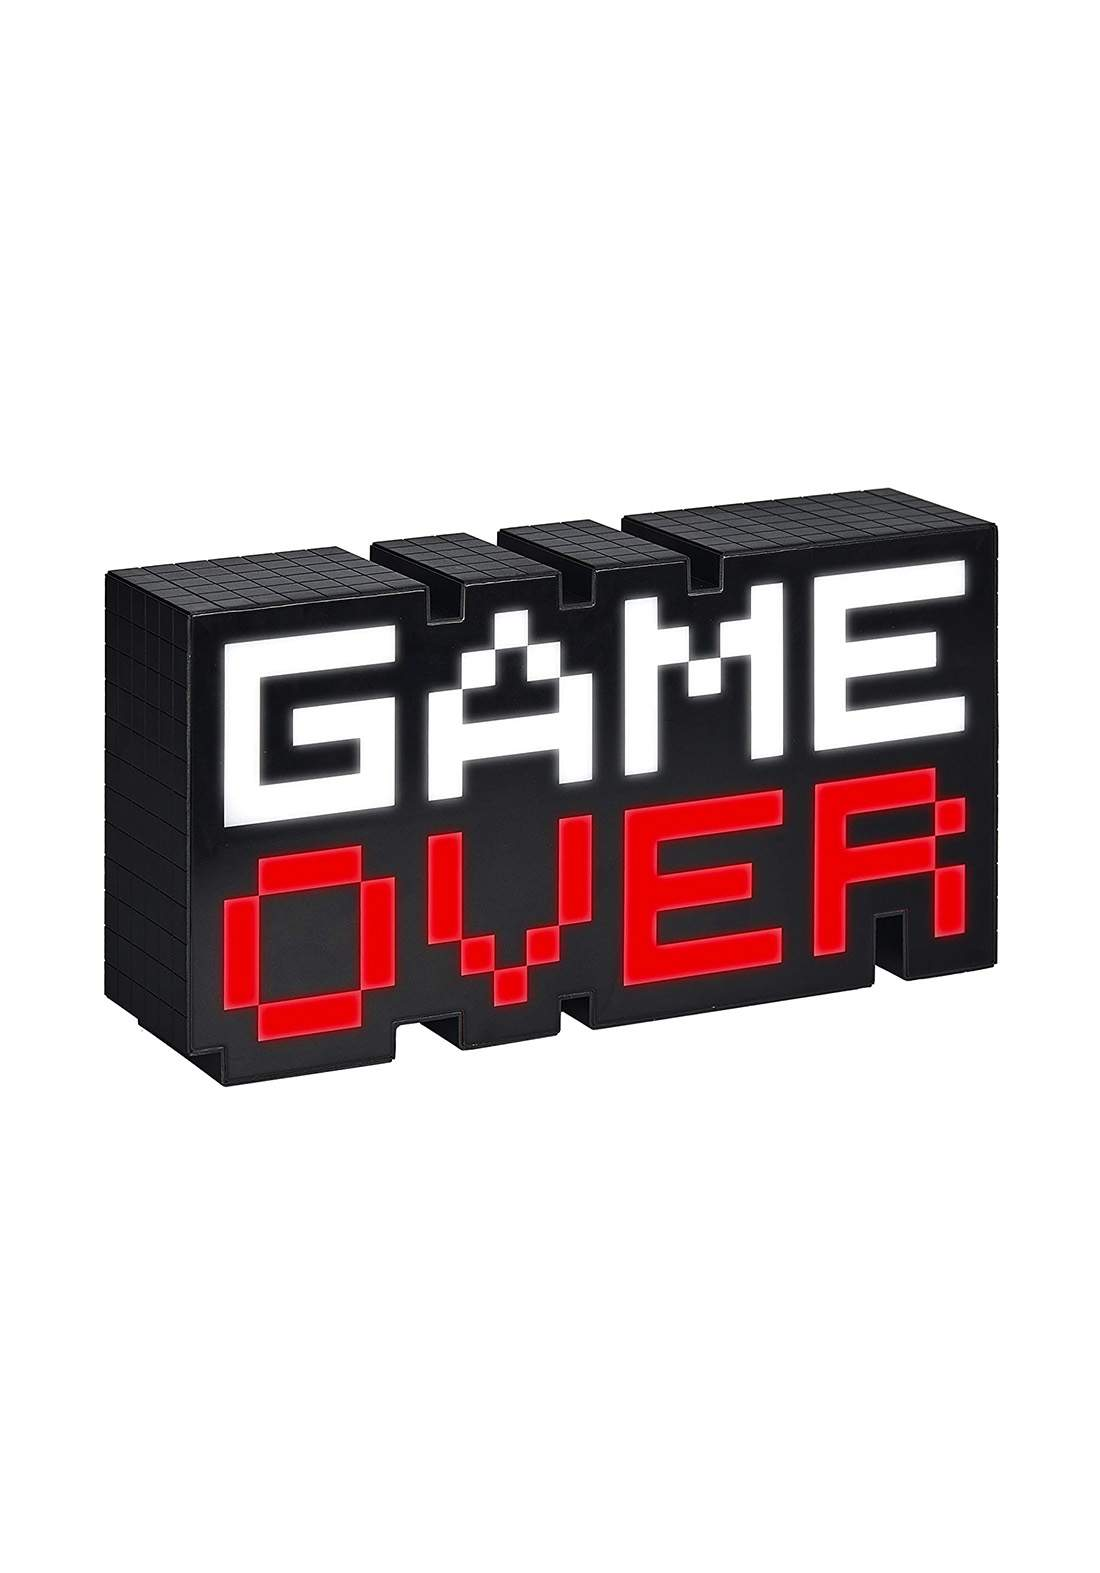 Paladone 8-Bit Pixel Game Over Light مصباح